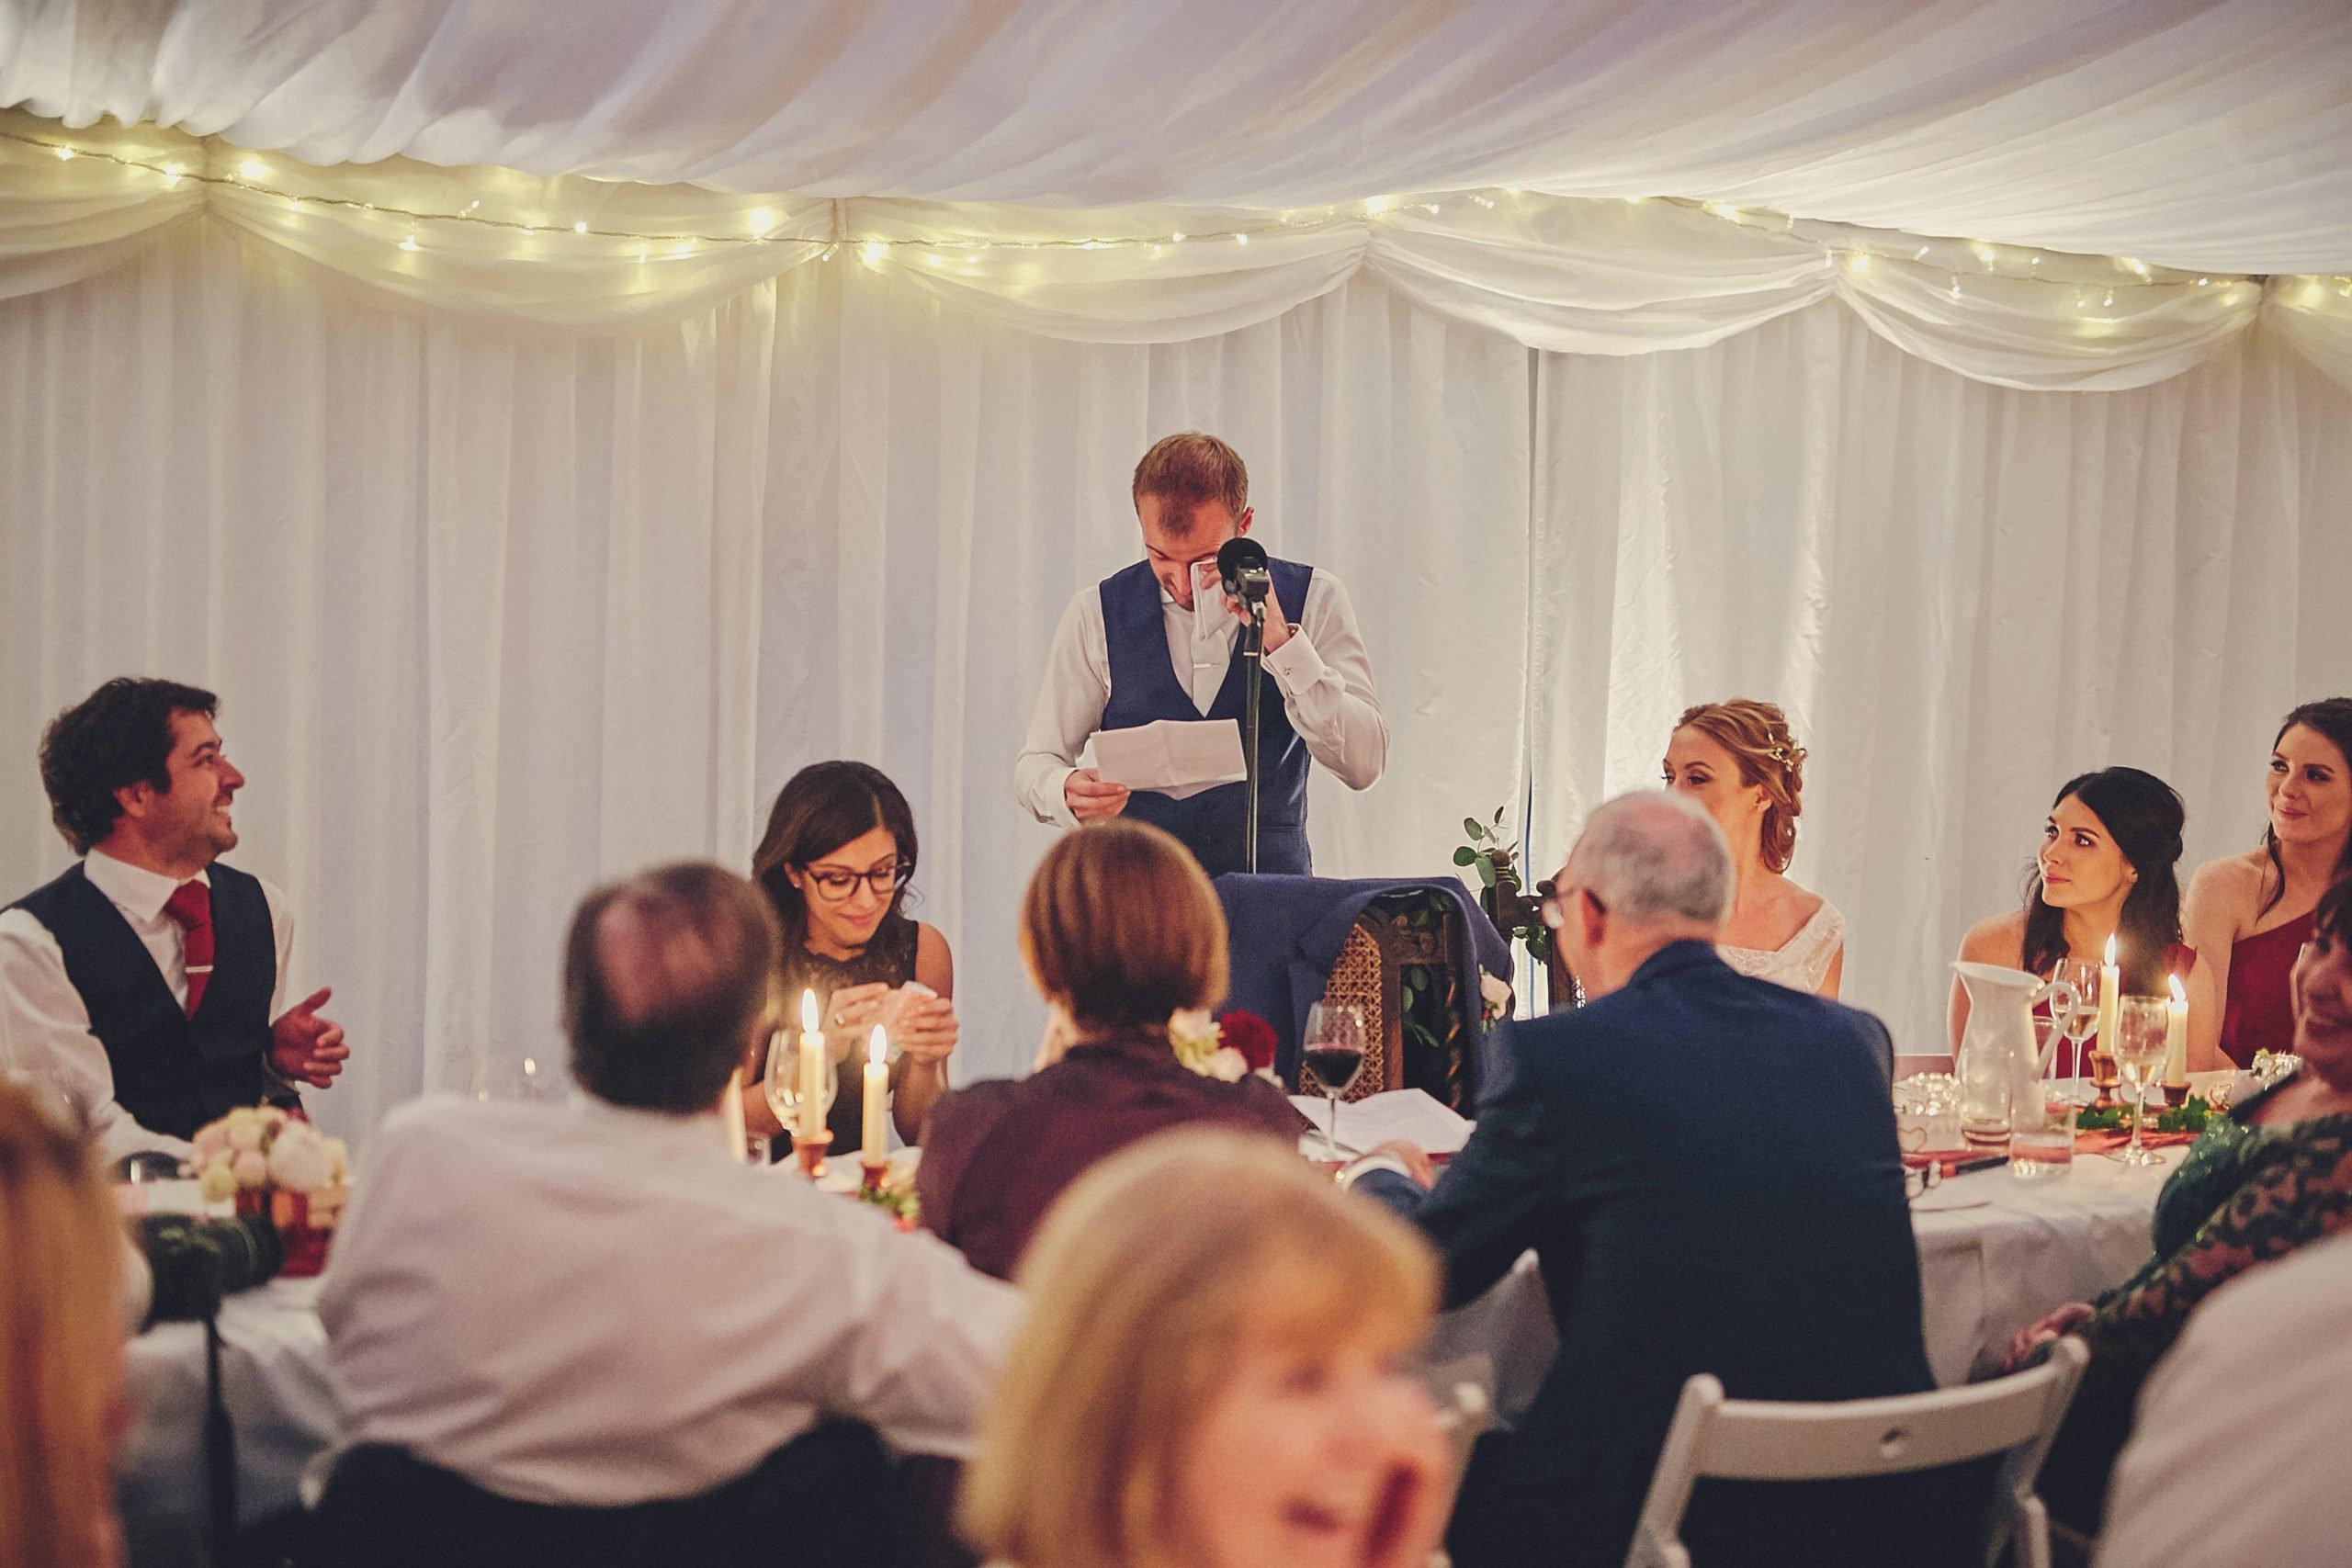 Cloughjordan House Wedding - Alternative Venue 134